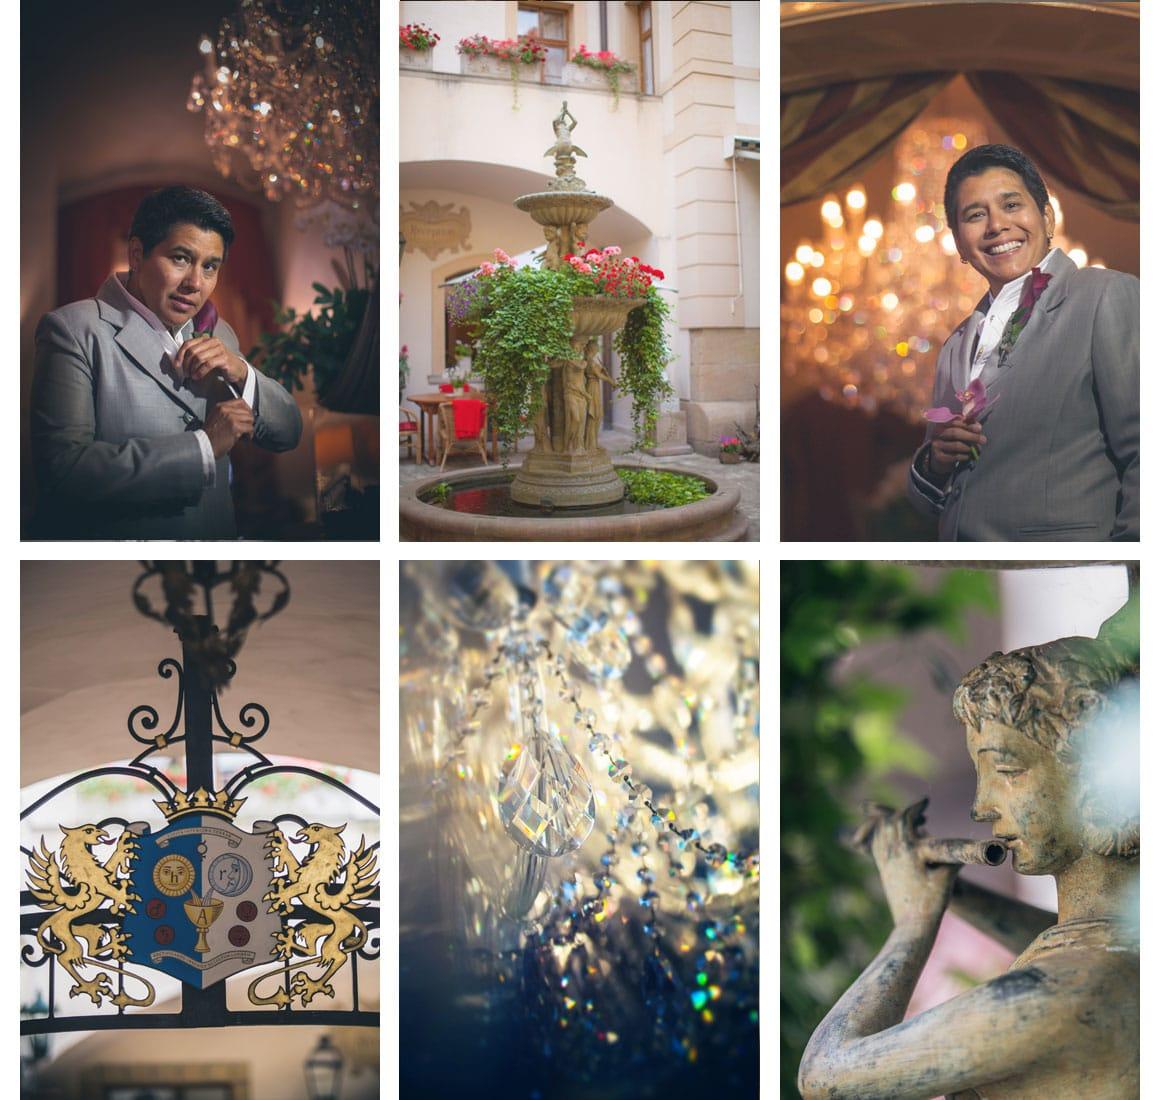 Charles Bridge Wedding / Kimberly & Jules / Alchymist wedding portraits